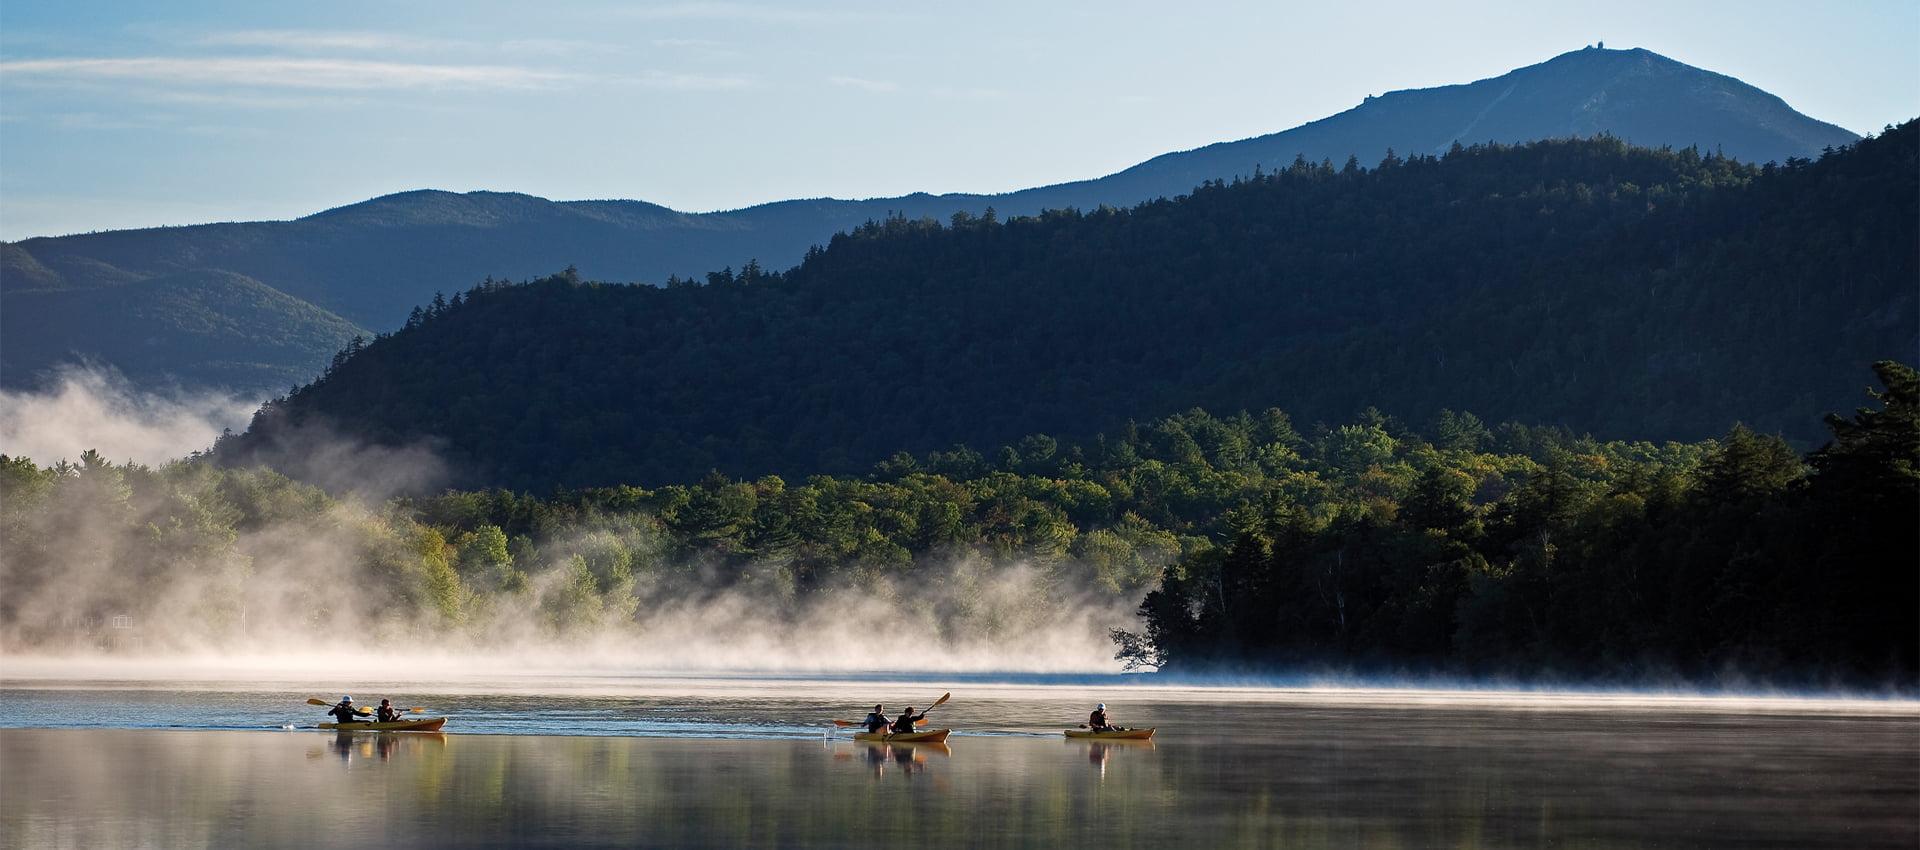 Mirror Lake at Lake Placid